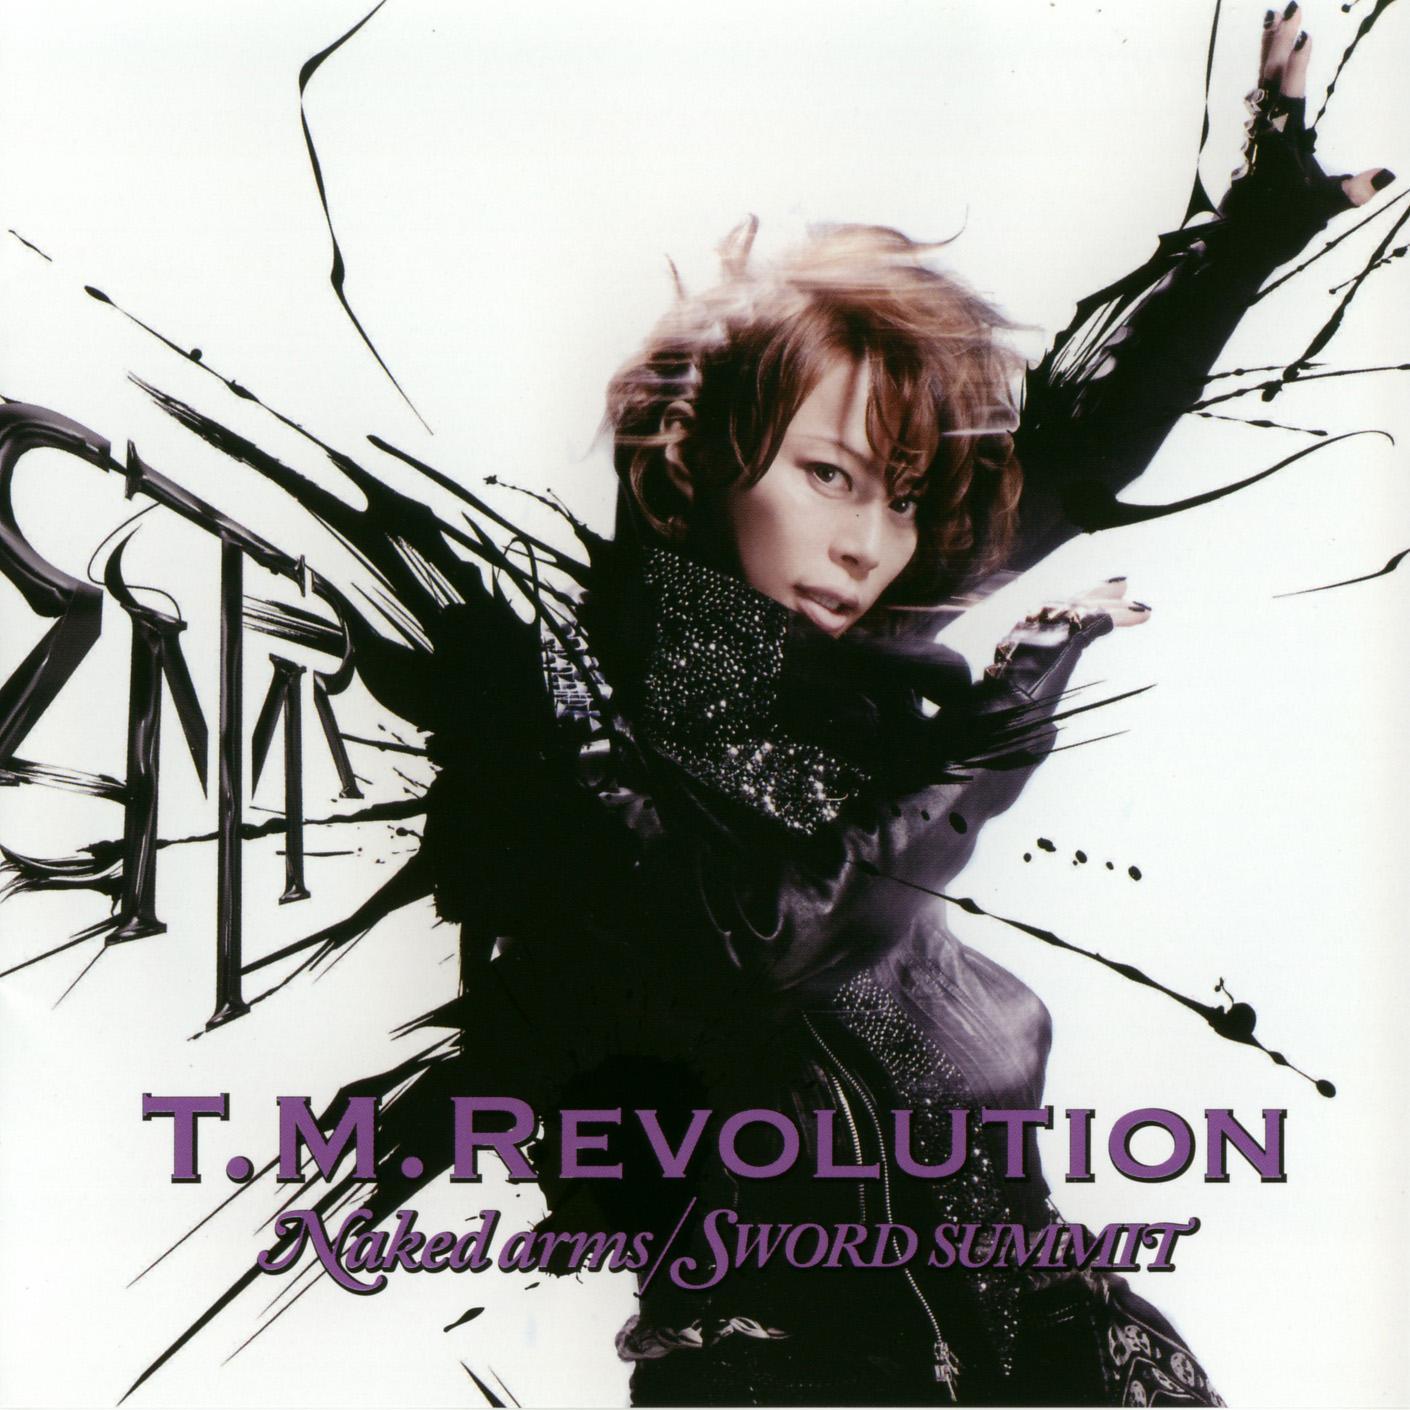 Naked arms / SWORD SUMMIT : T.M.Revolution | HMV&BOOKS